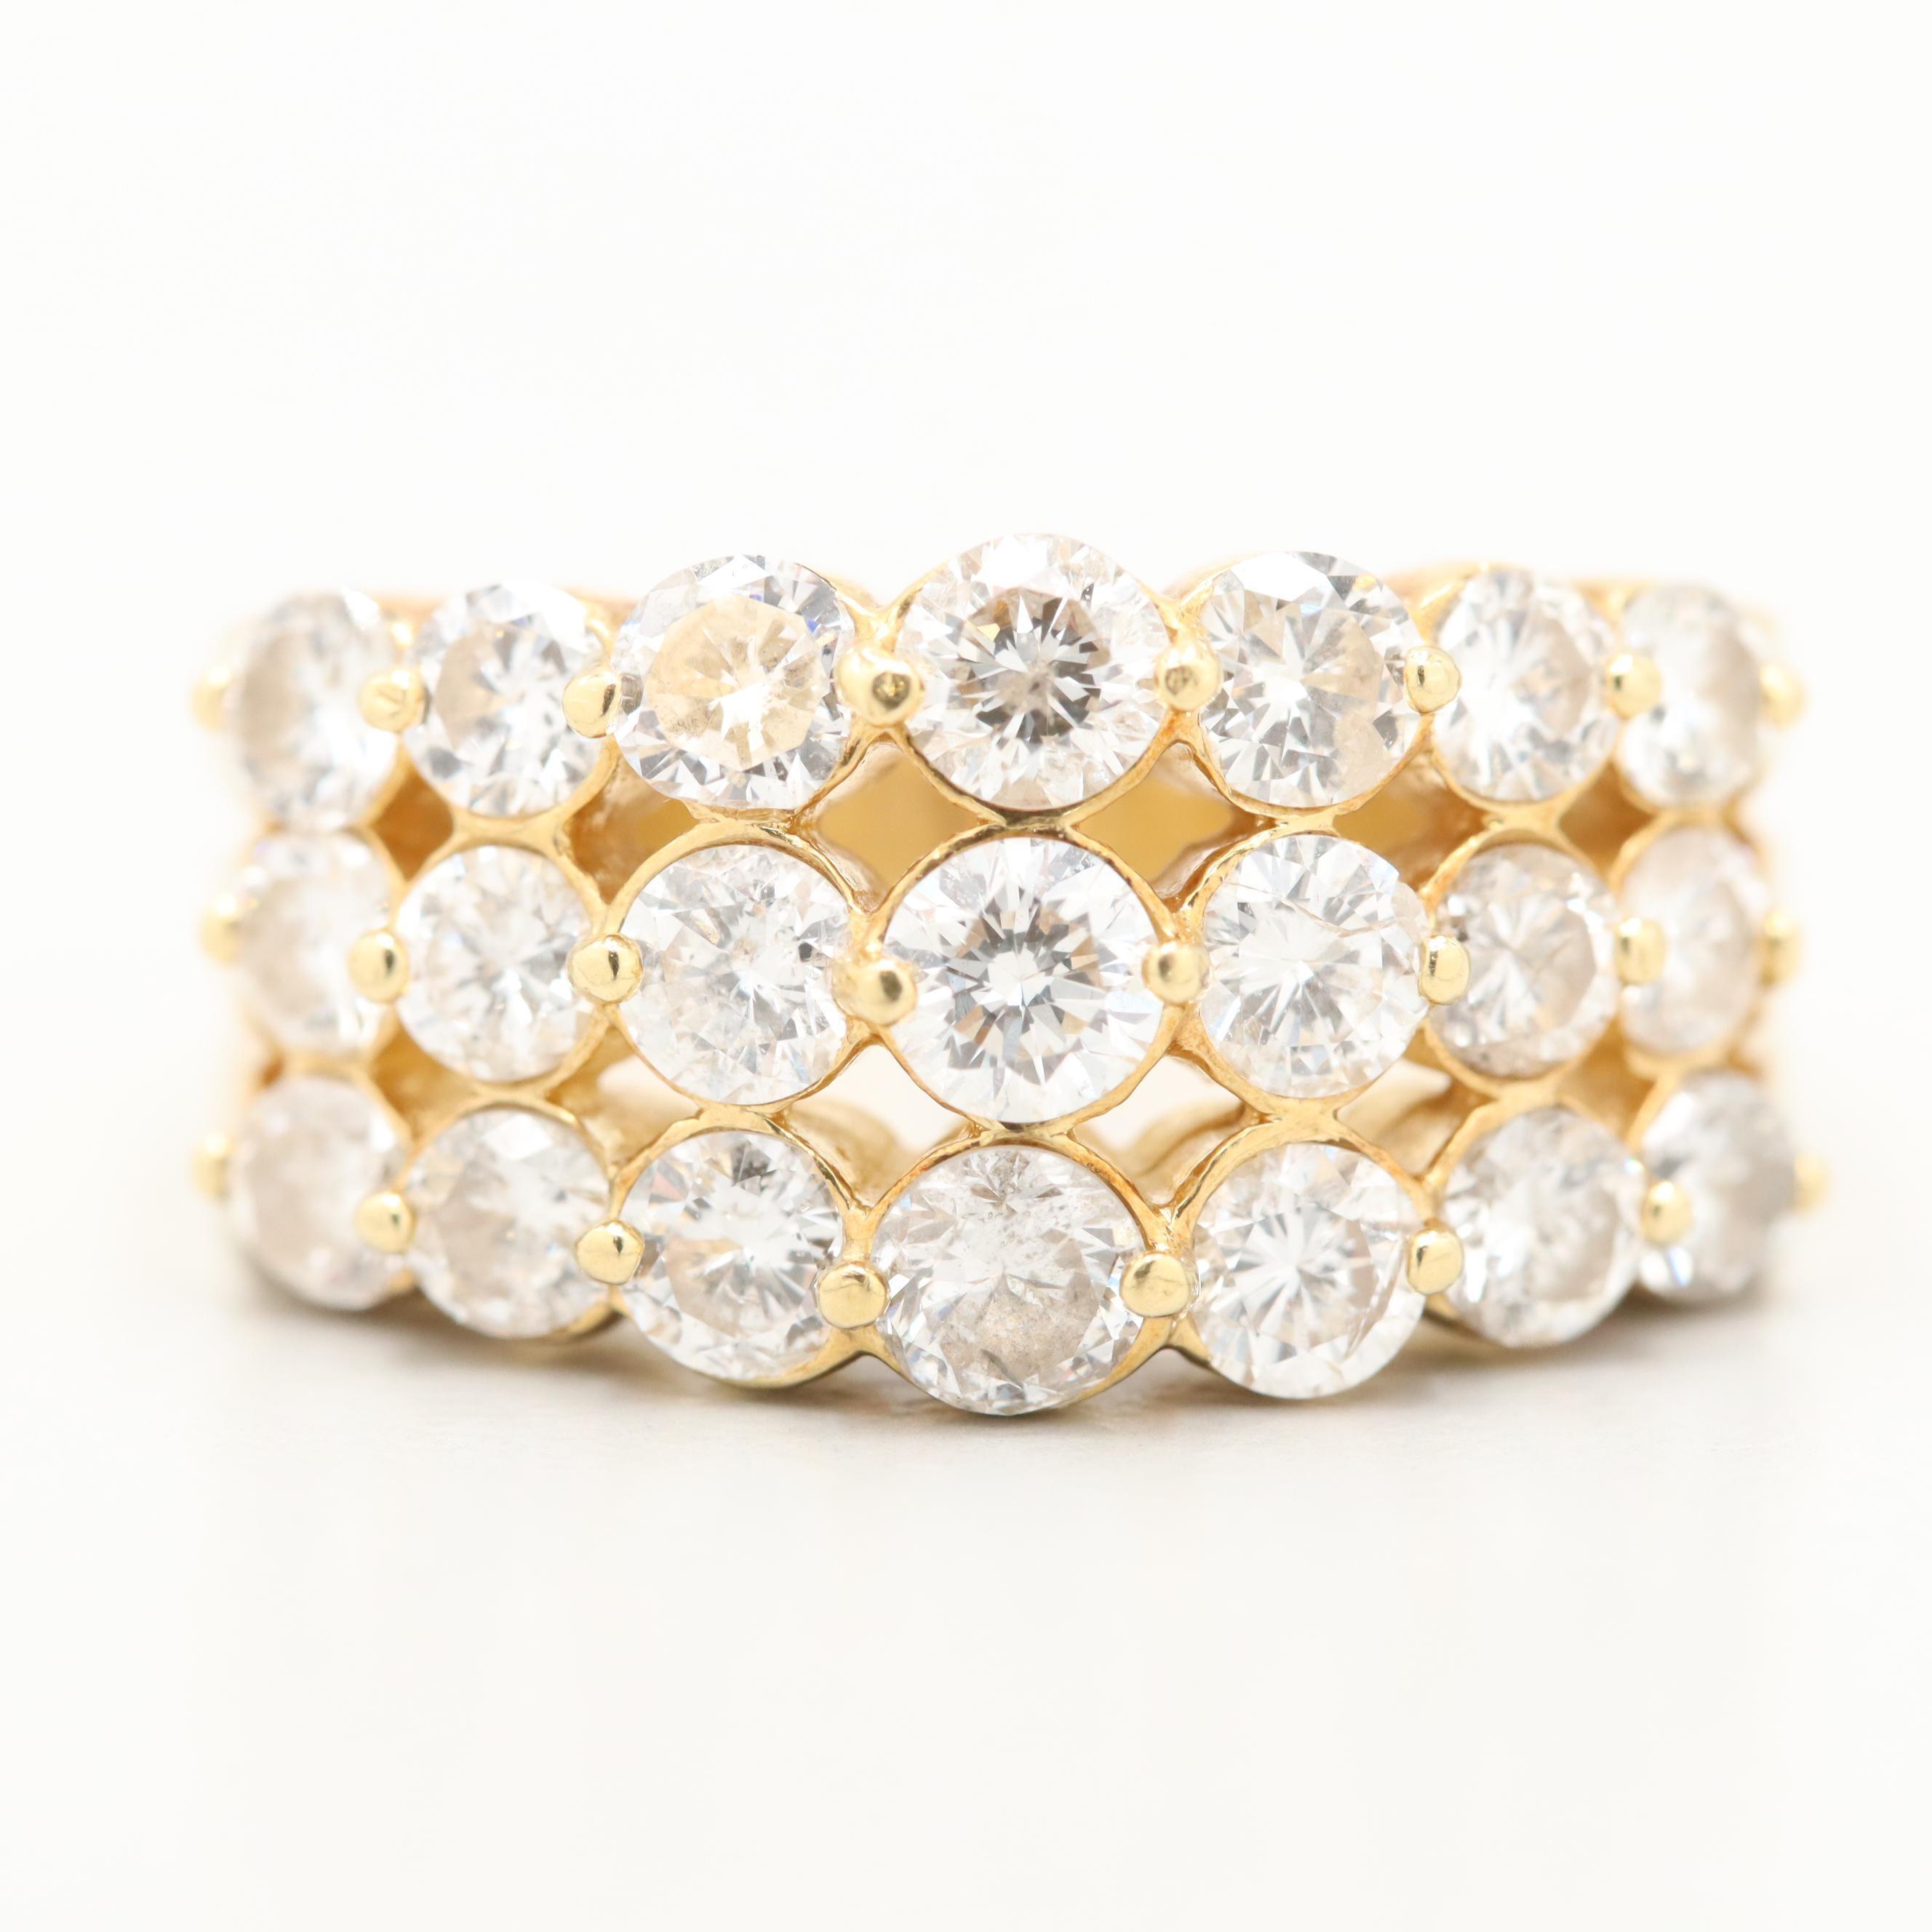 18K Yellow Gold 2.35 CTW Diamond Ring